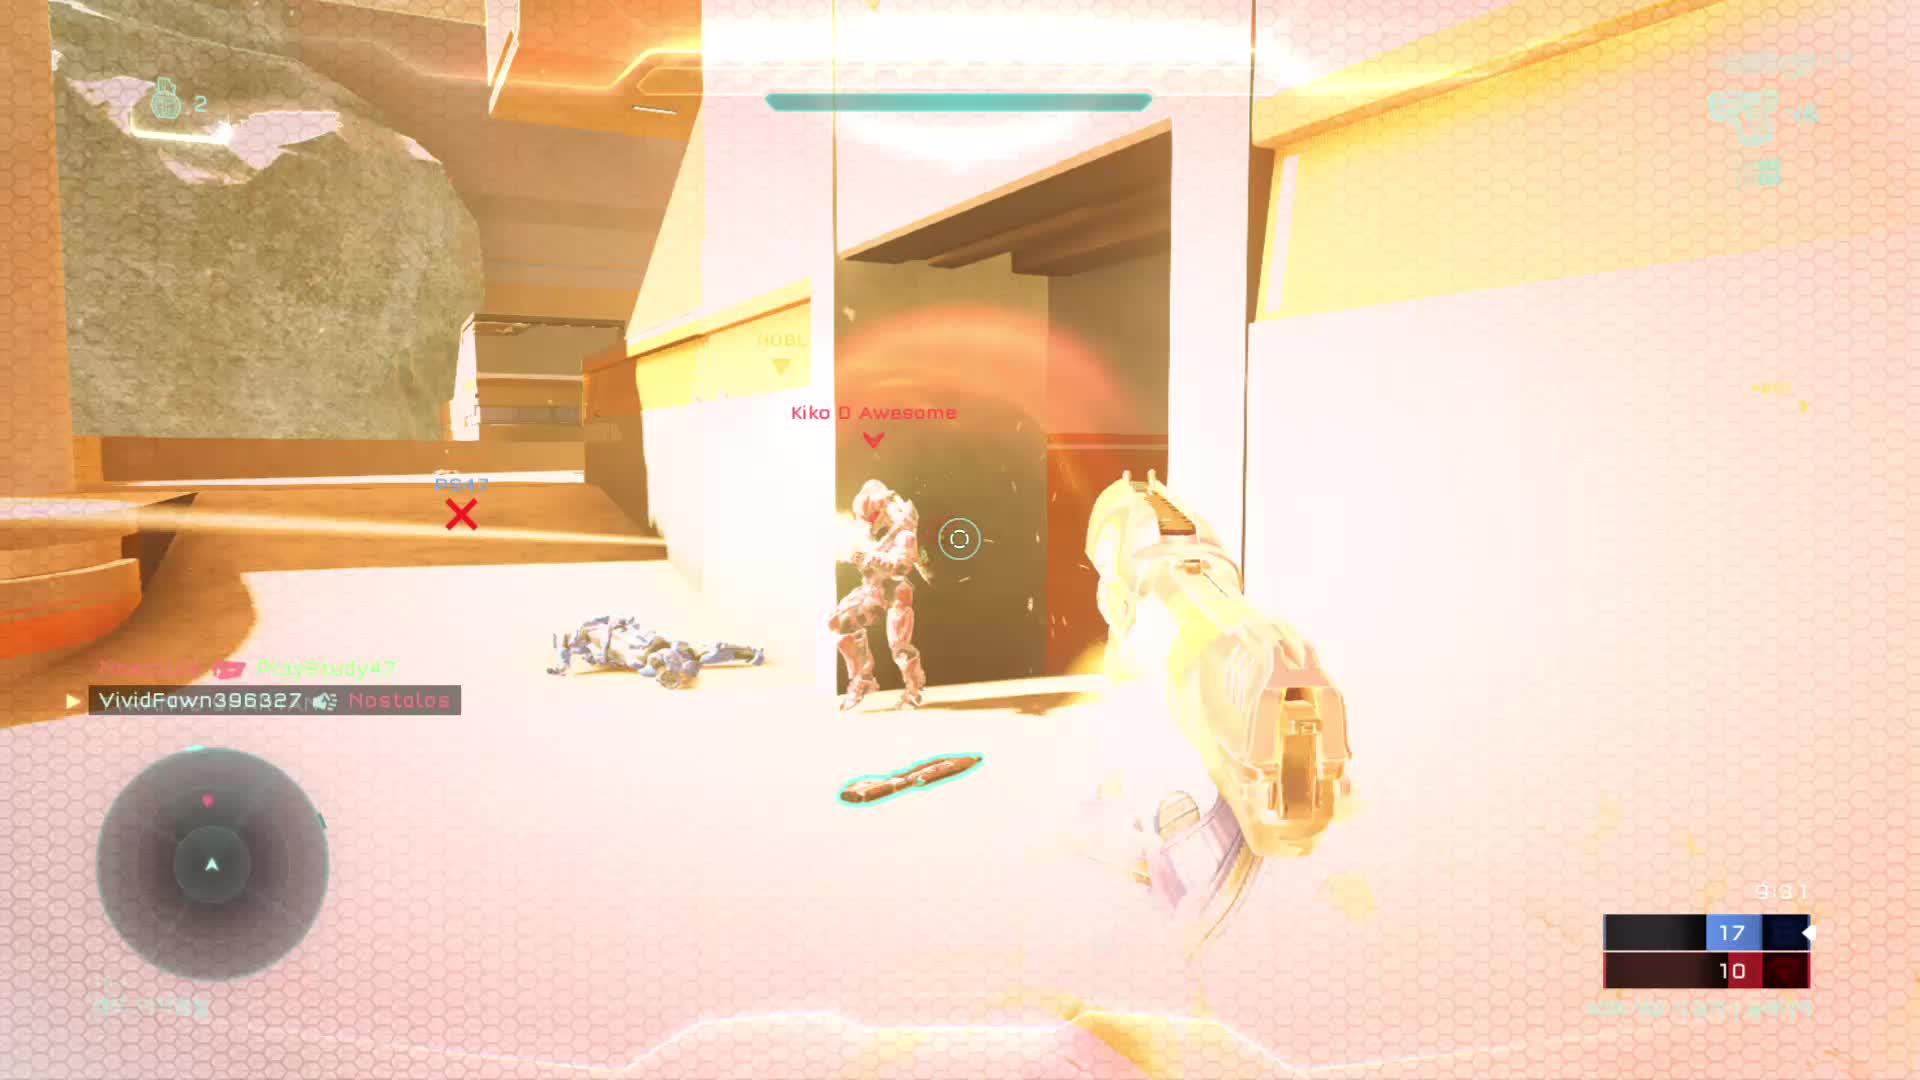 Futurefurit, Halo5Guardians, gamer dvr, xbox, xbox one,  GIFs